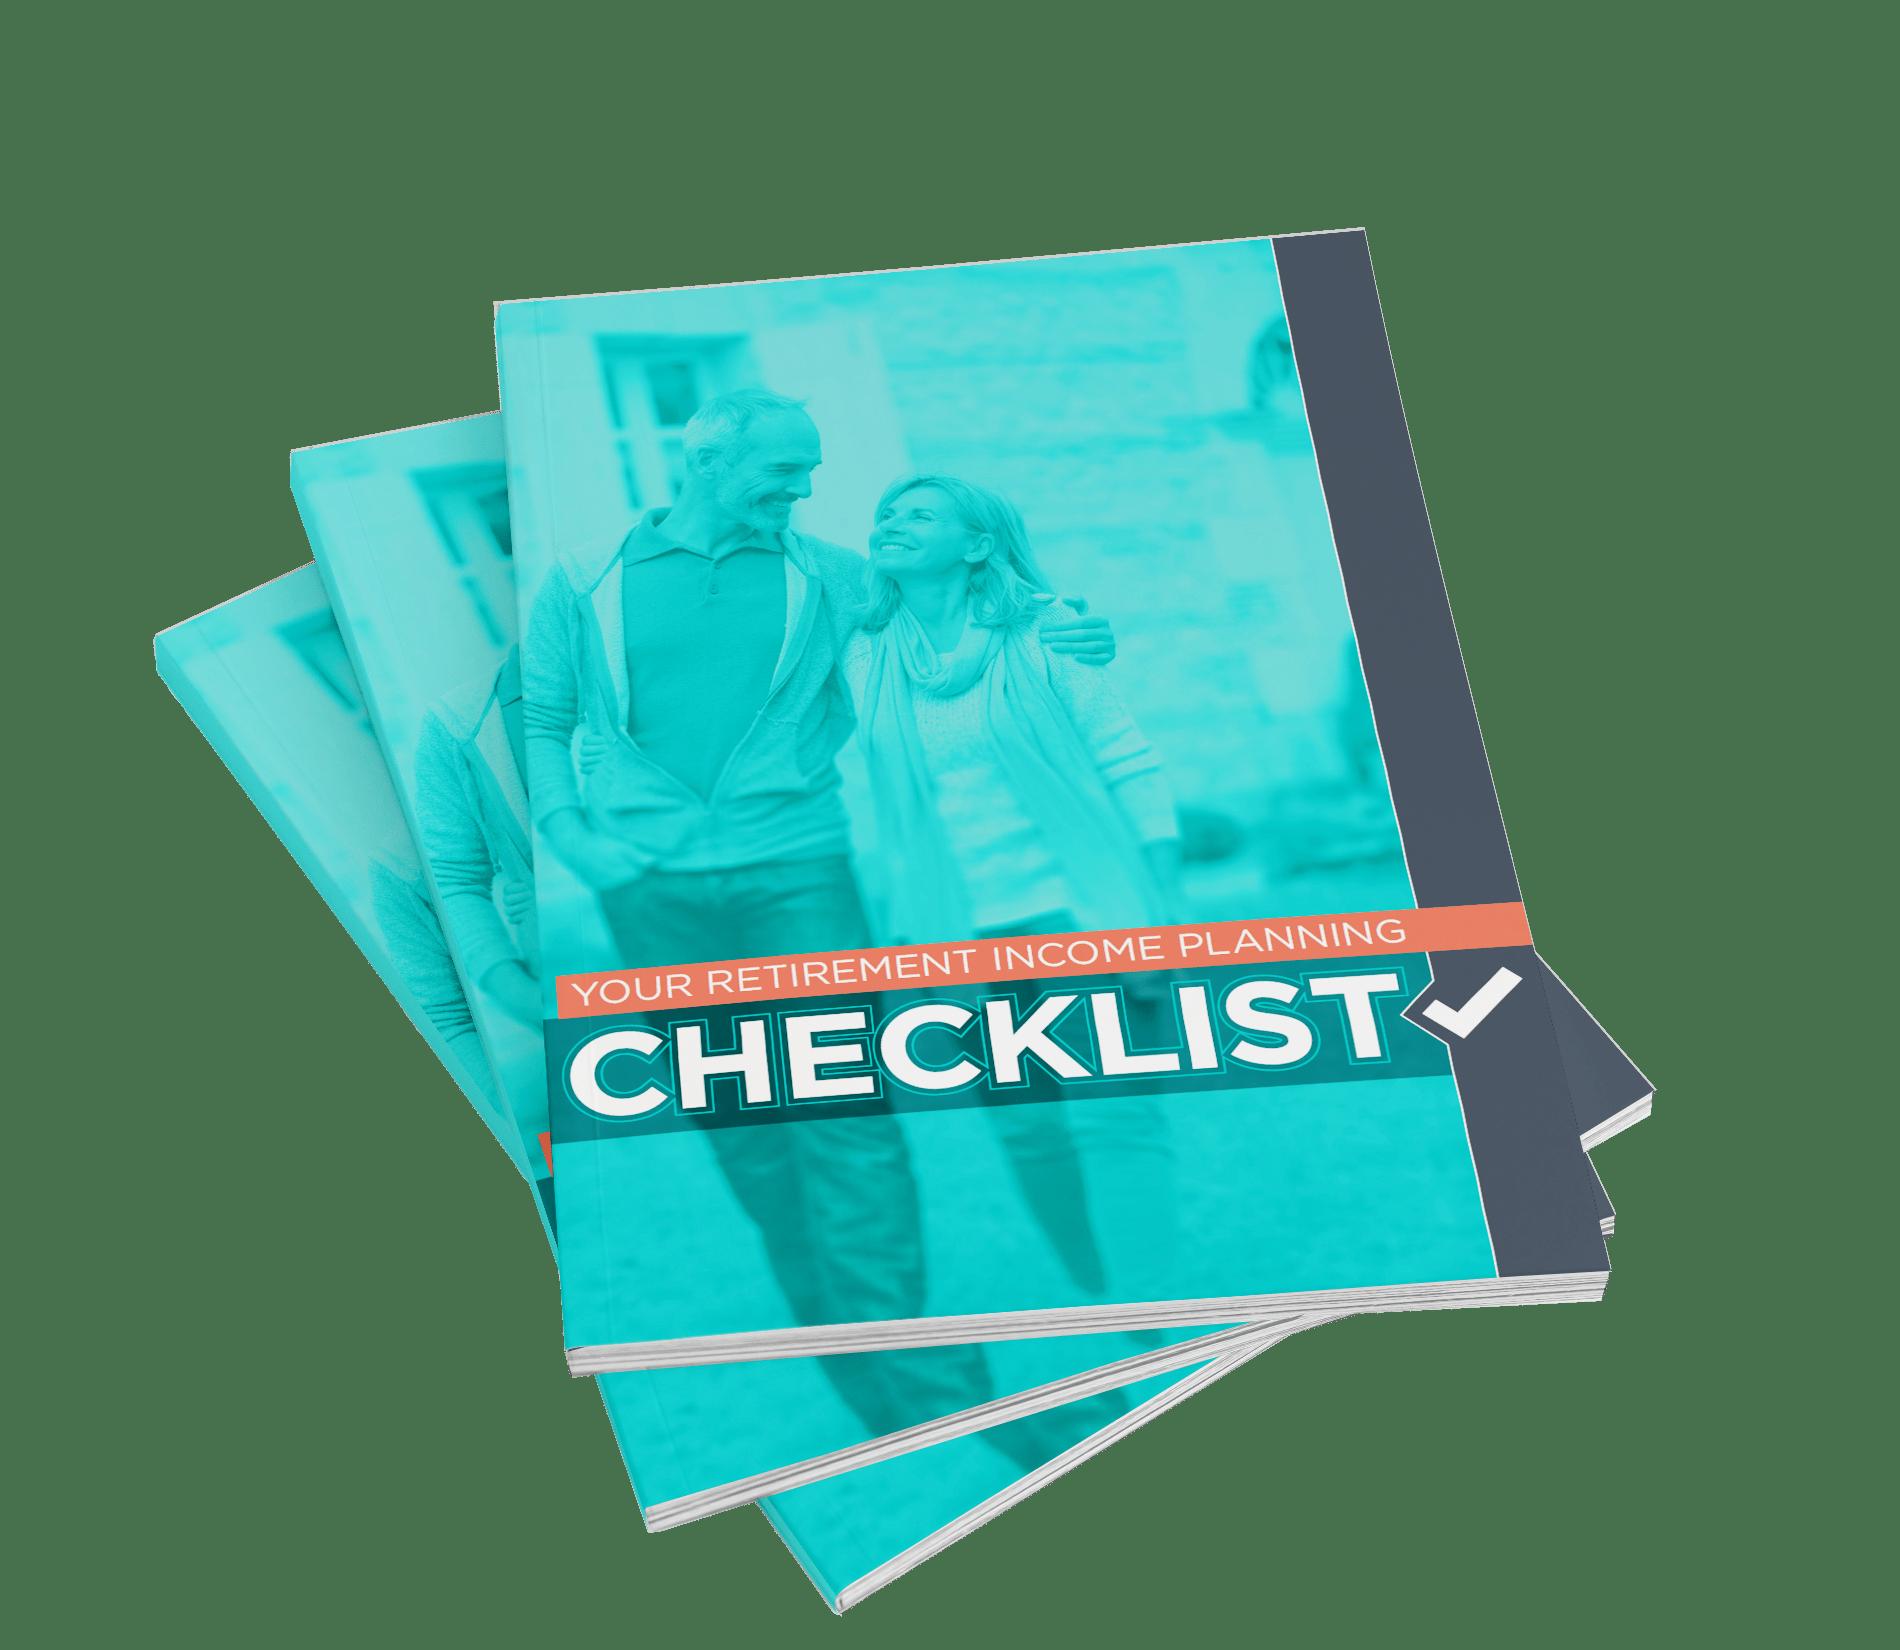 Retirement Checklist Mockup